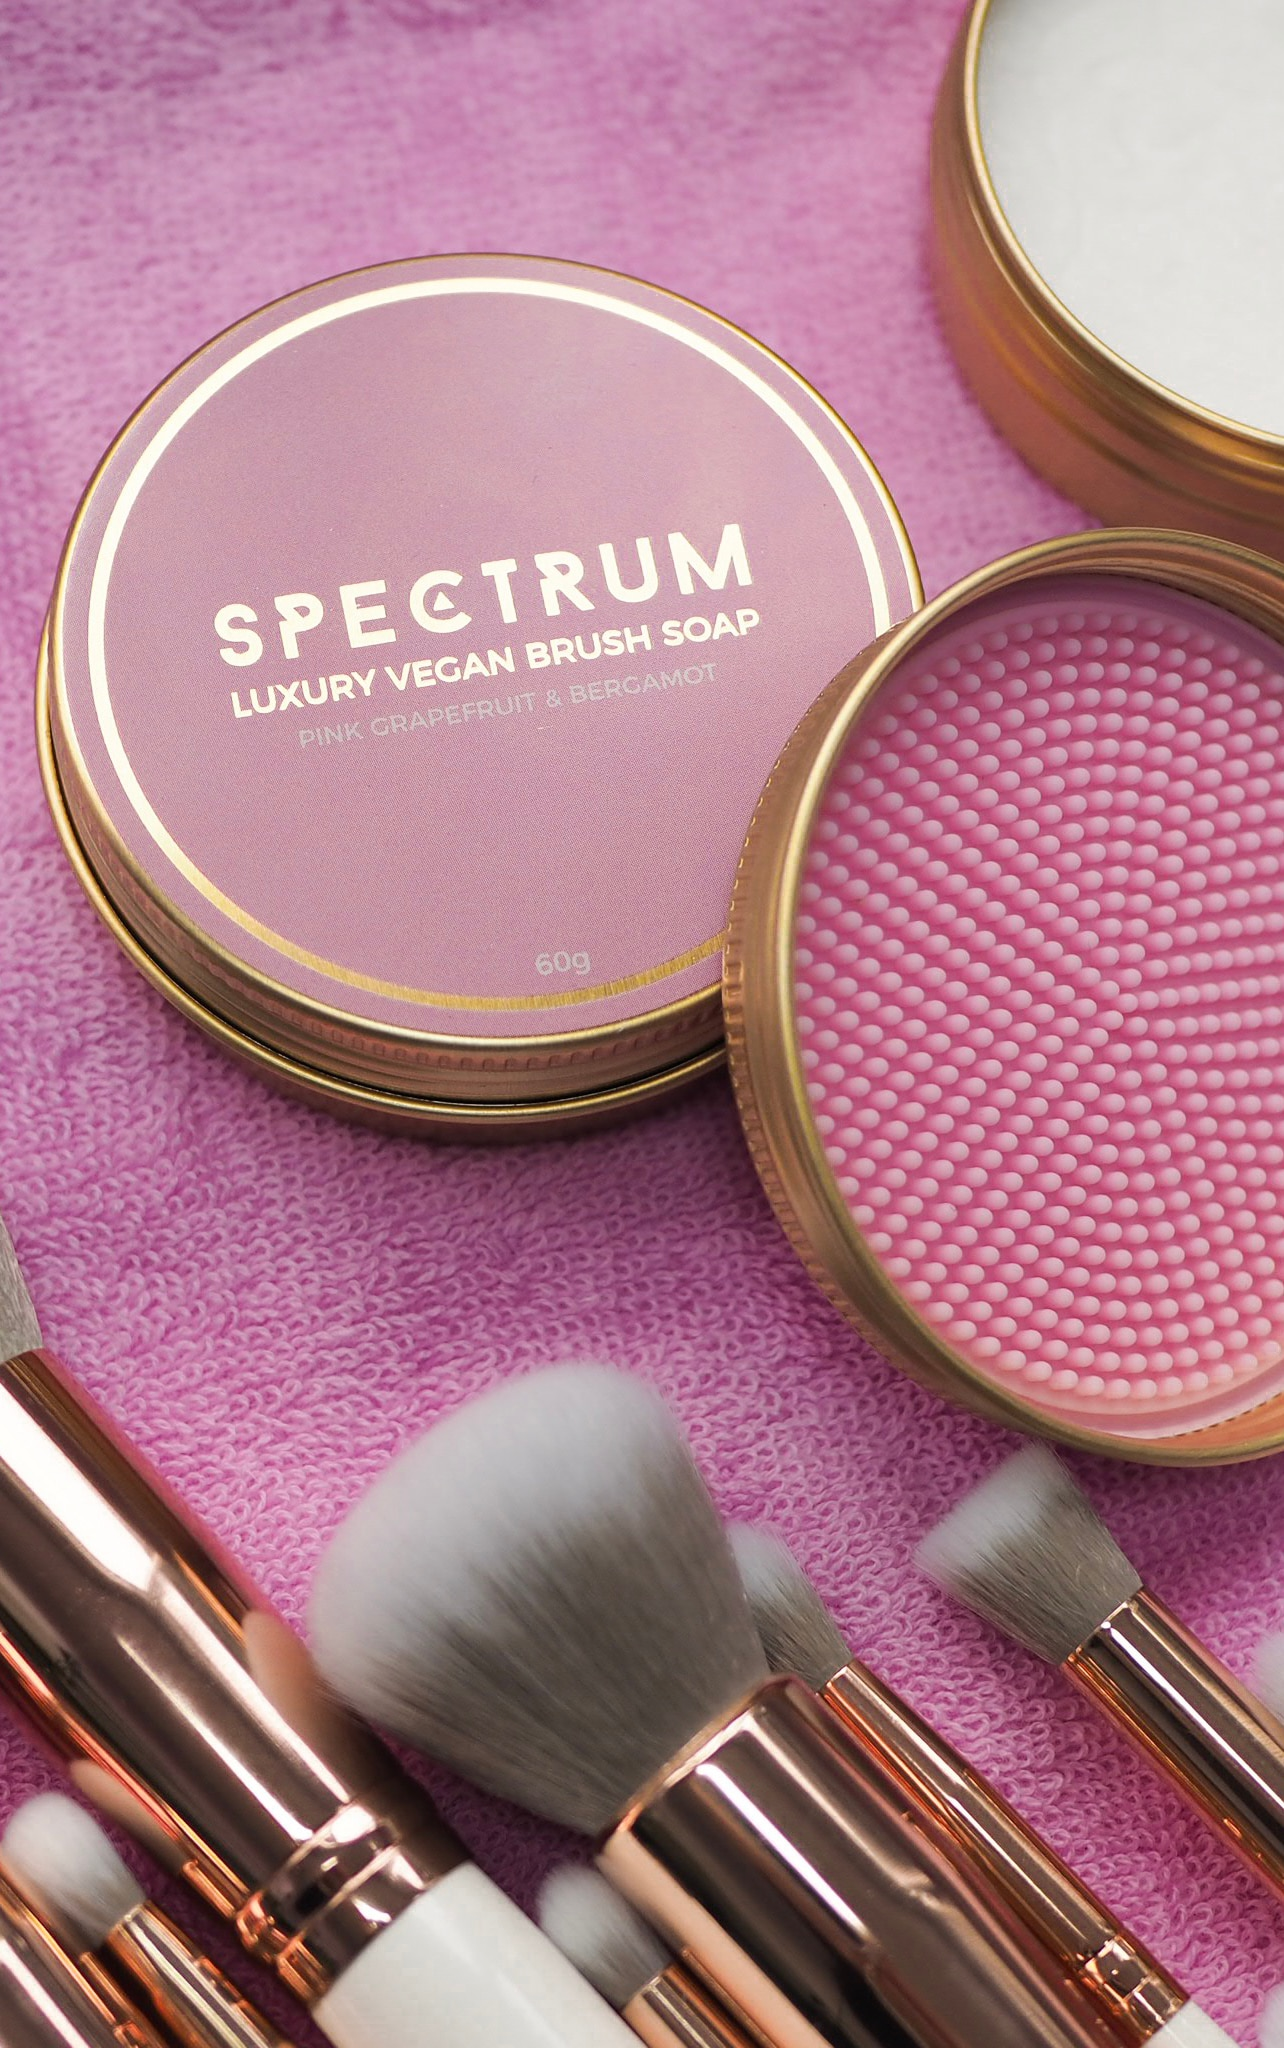 Spectrum Collections Millennial Bergamot and Grapefruit Brush Soap 5